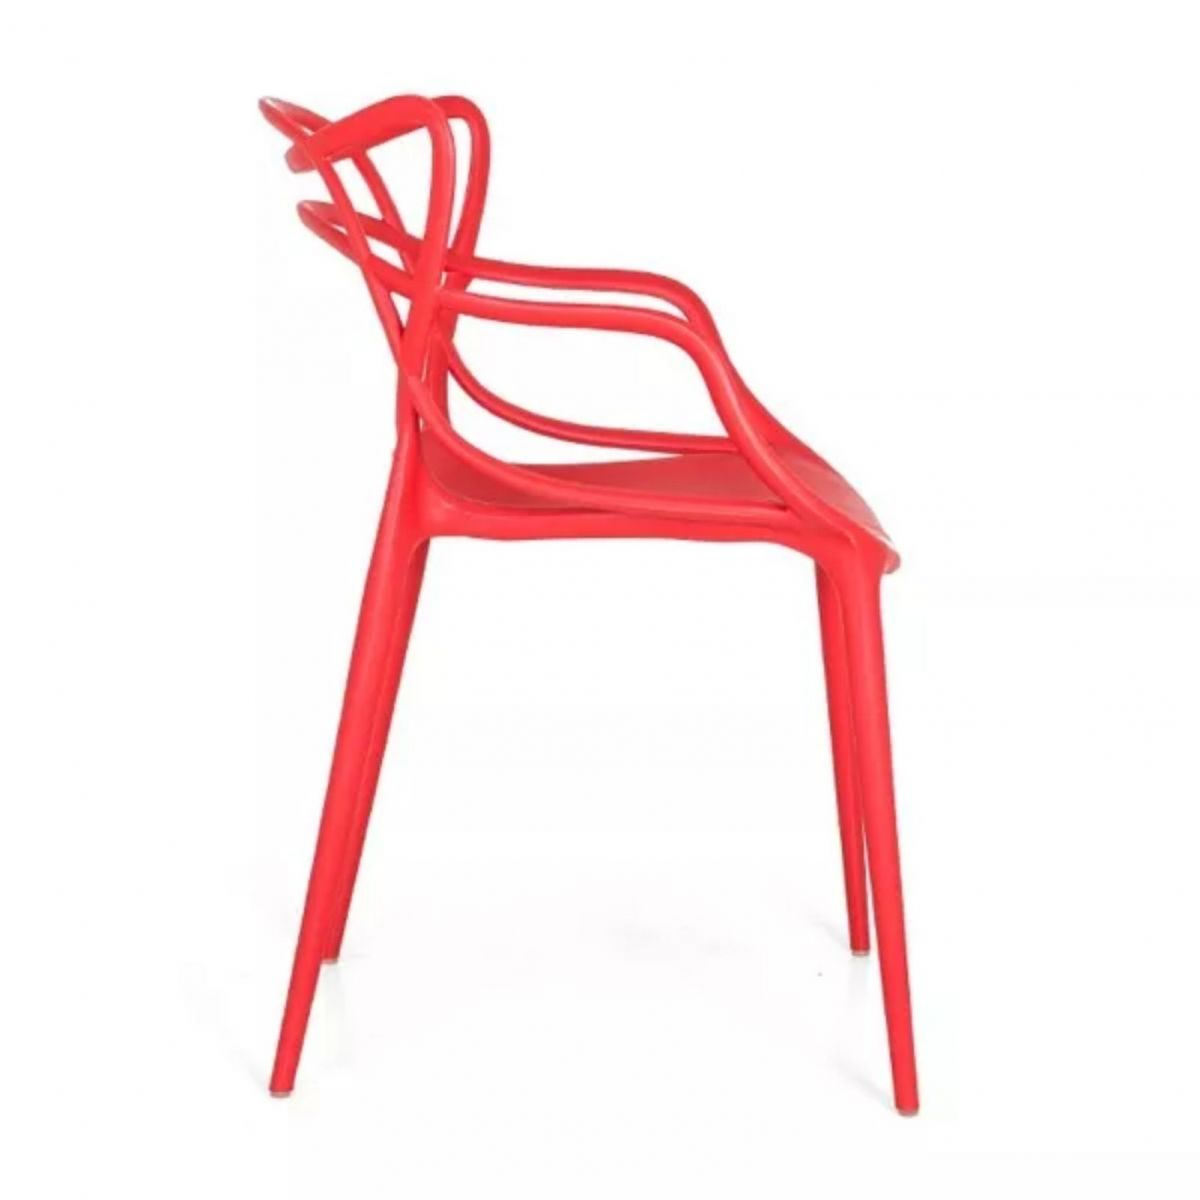 Cadeira Fixa Design Allegra Pelegrin PEL-1737